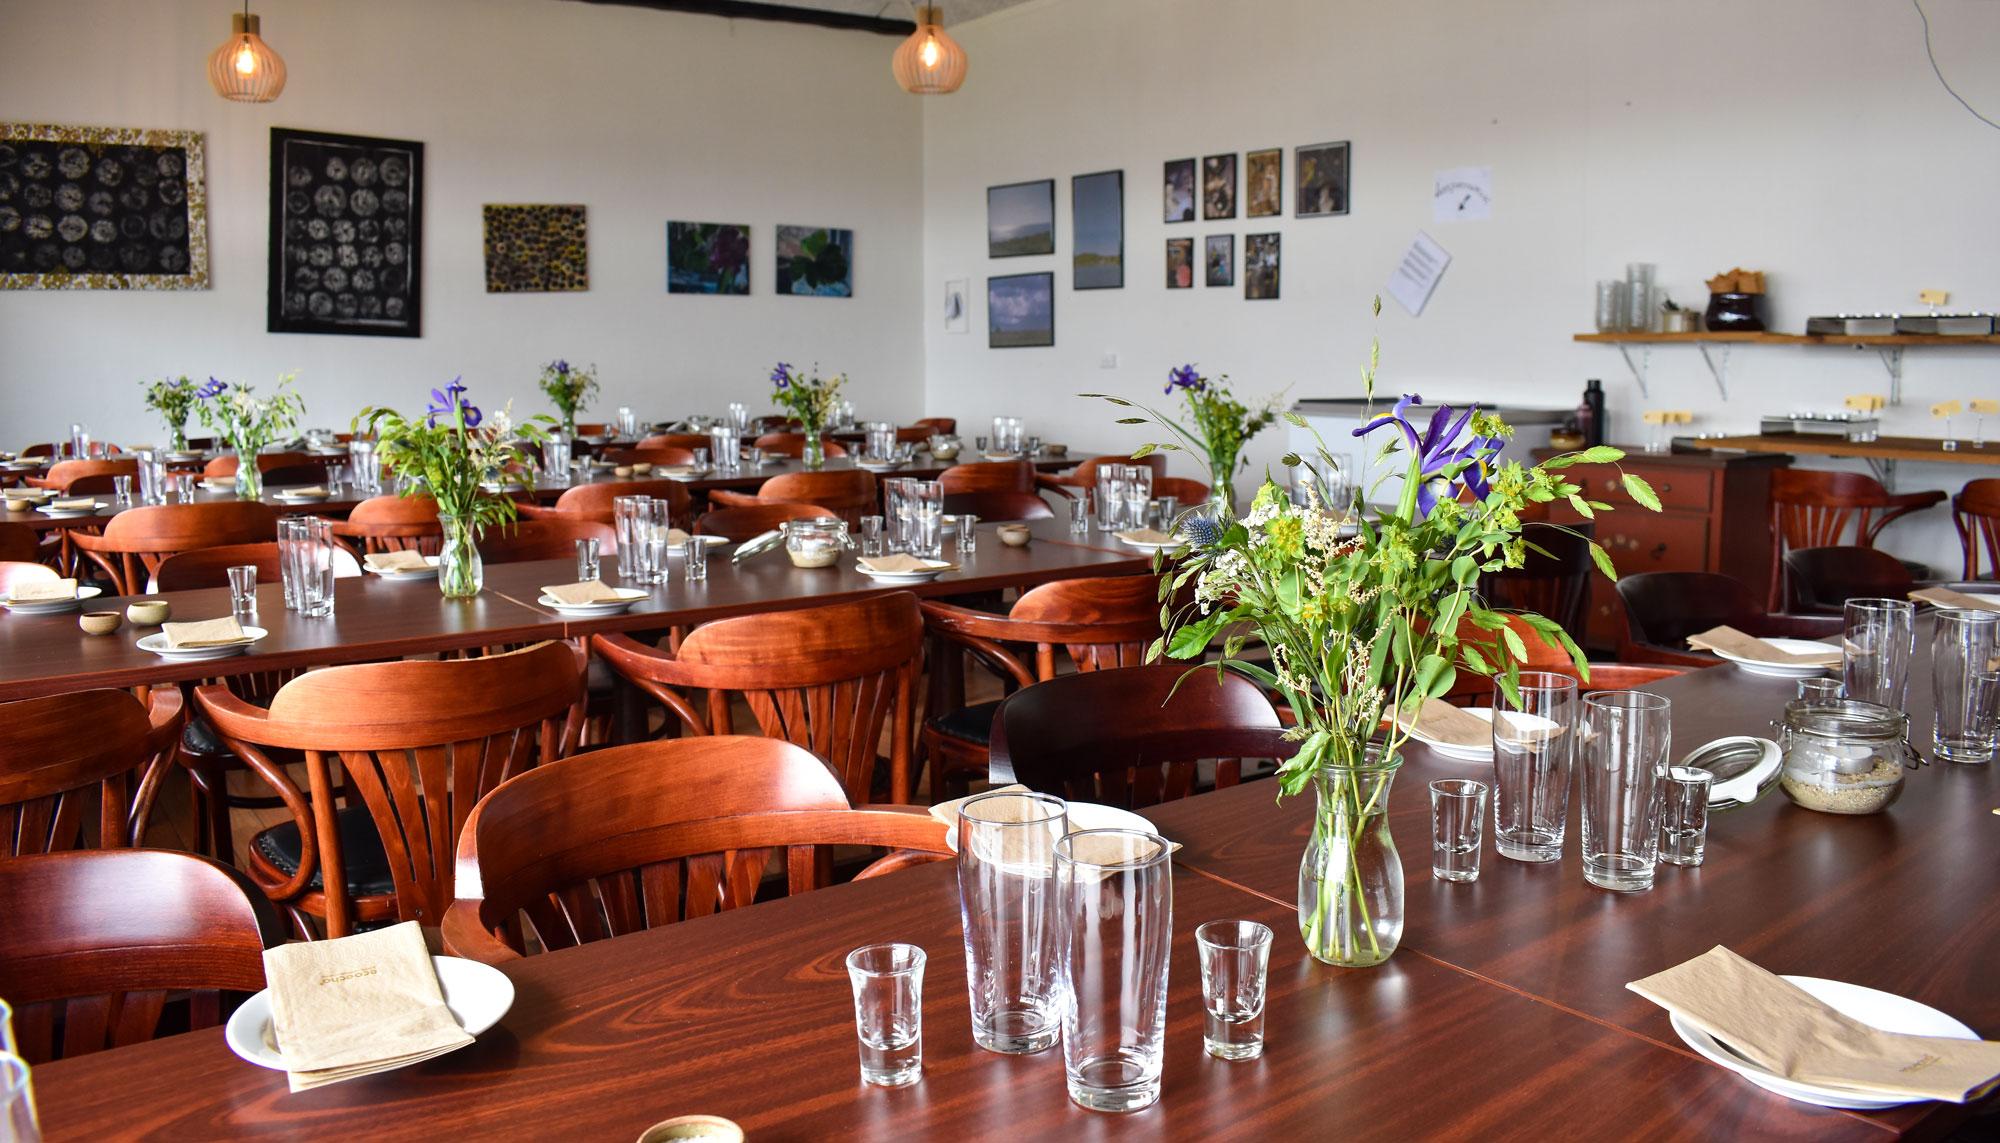 Fristende retter på menukortet: Restaurant Kronborg holder aftenåbent hele pinsen